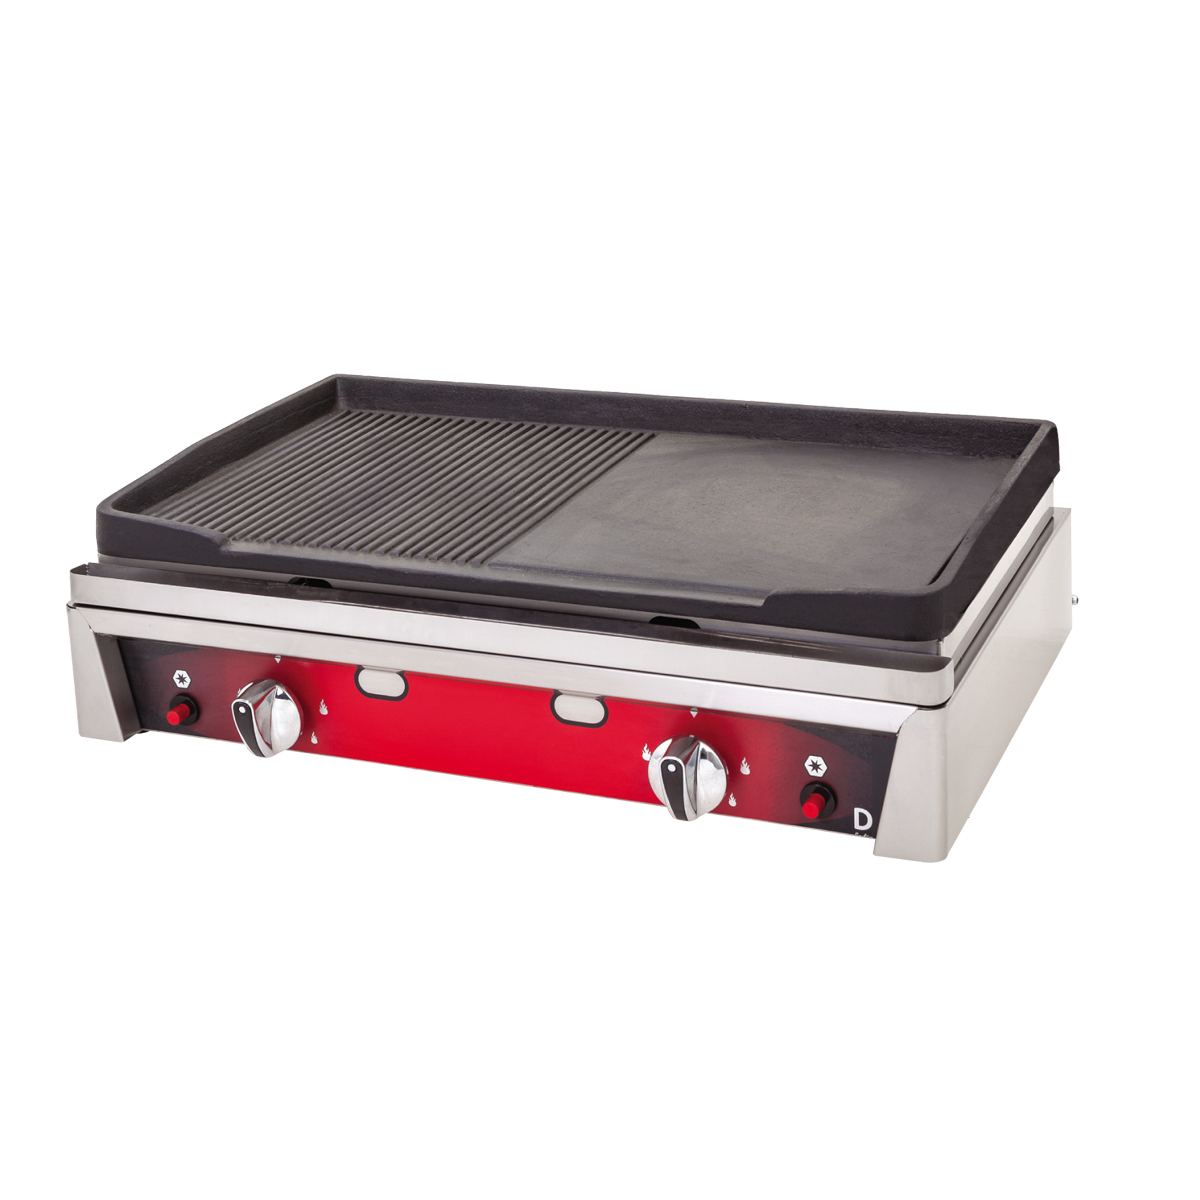 Cast Iron Grill Plus - 70cm - Gas